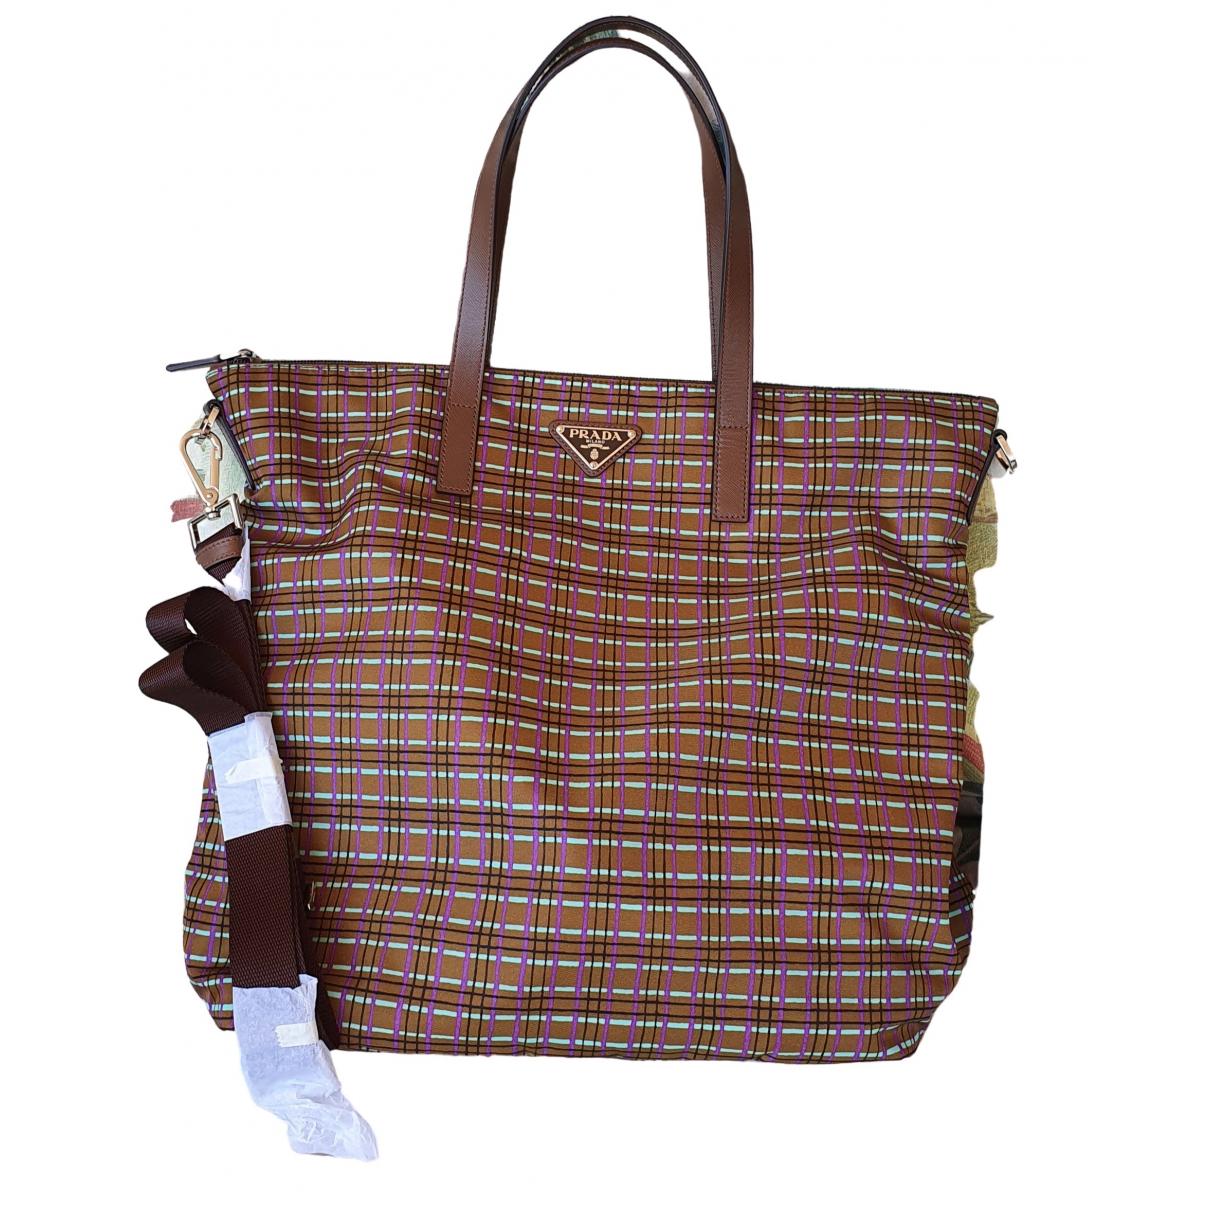 Prada \N Multicolour handbag for Women \N